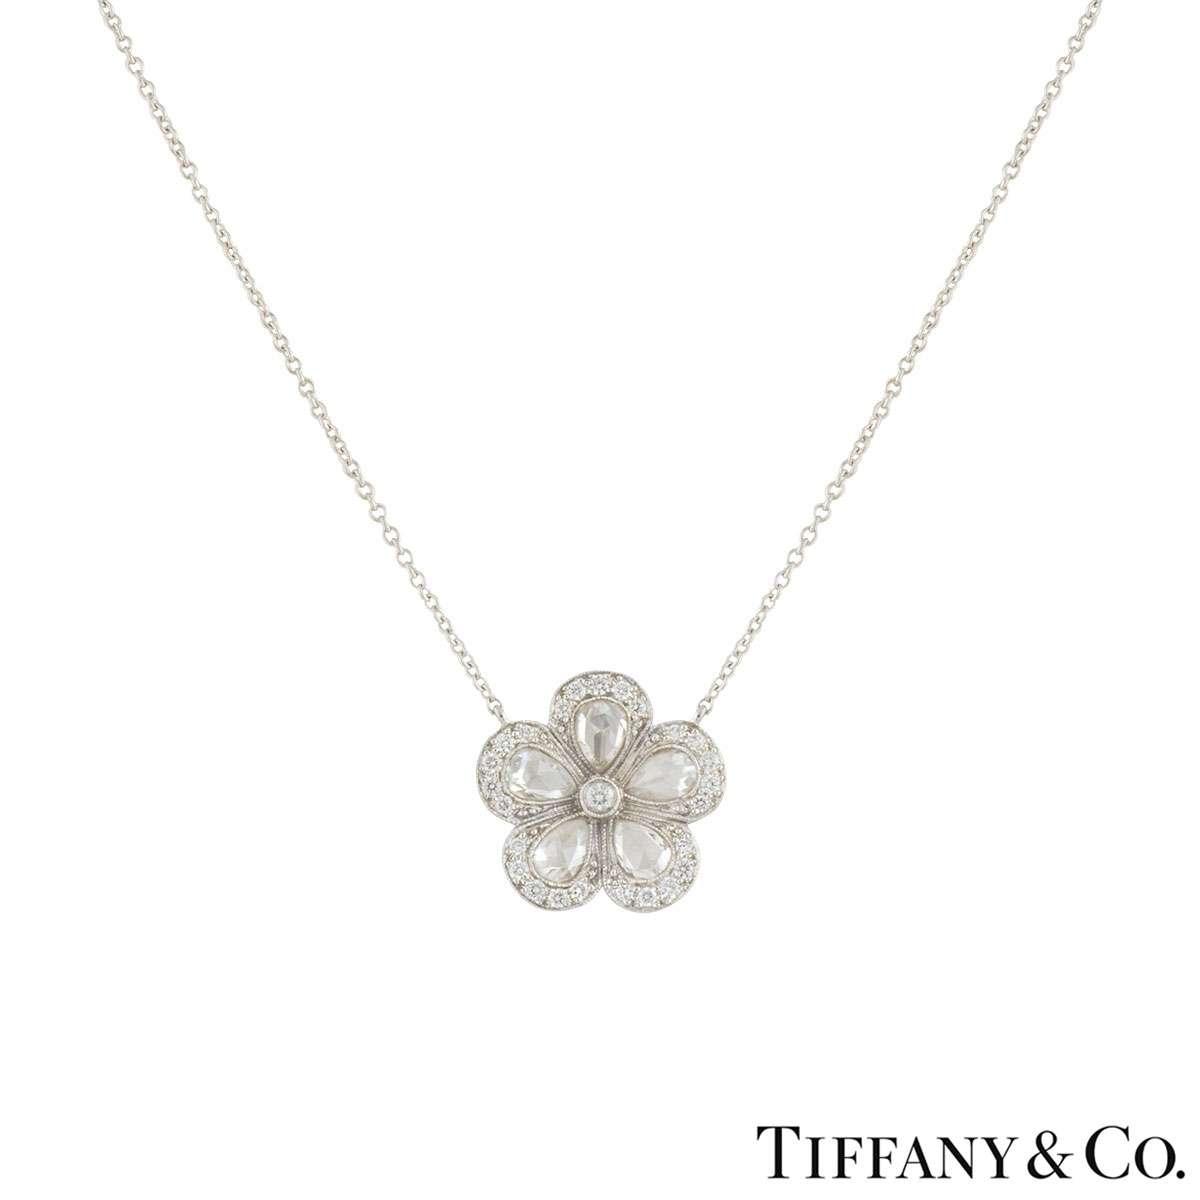 Tiffany & Co. Garden Flower Necklace 1.86ct G+/VS+